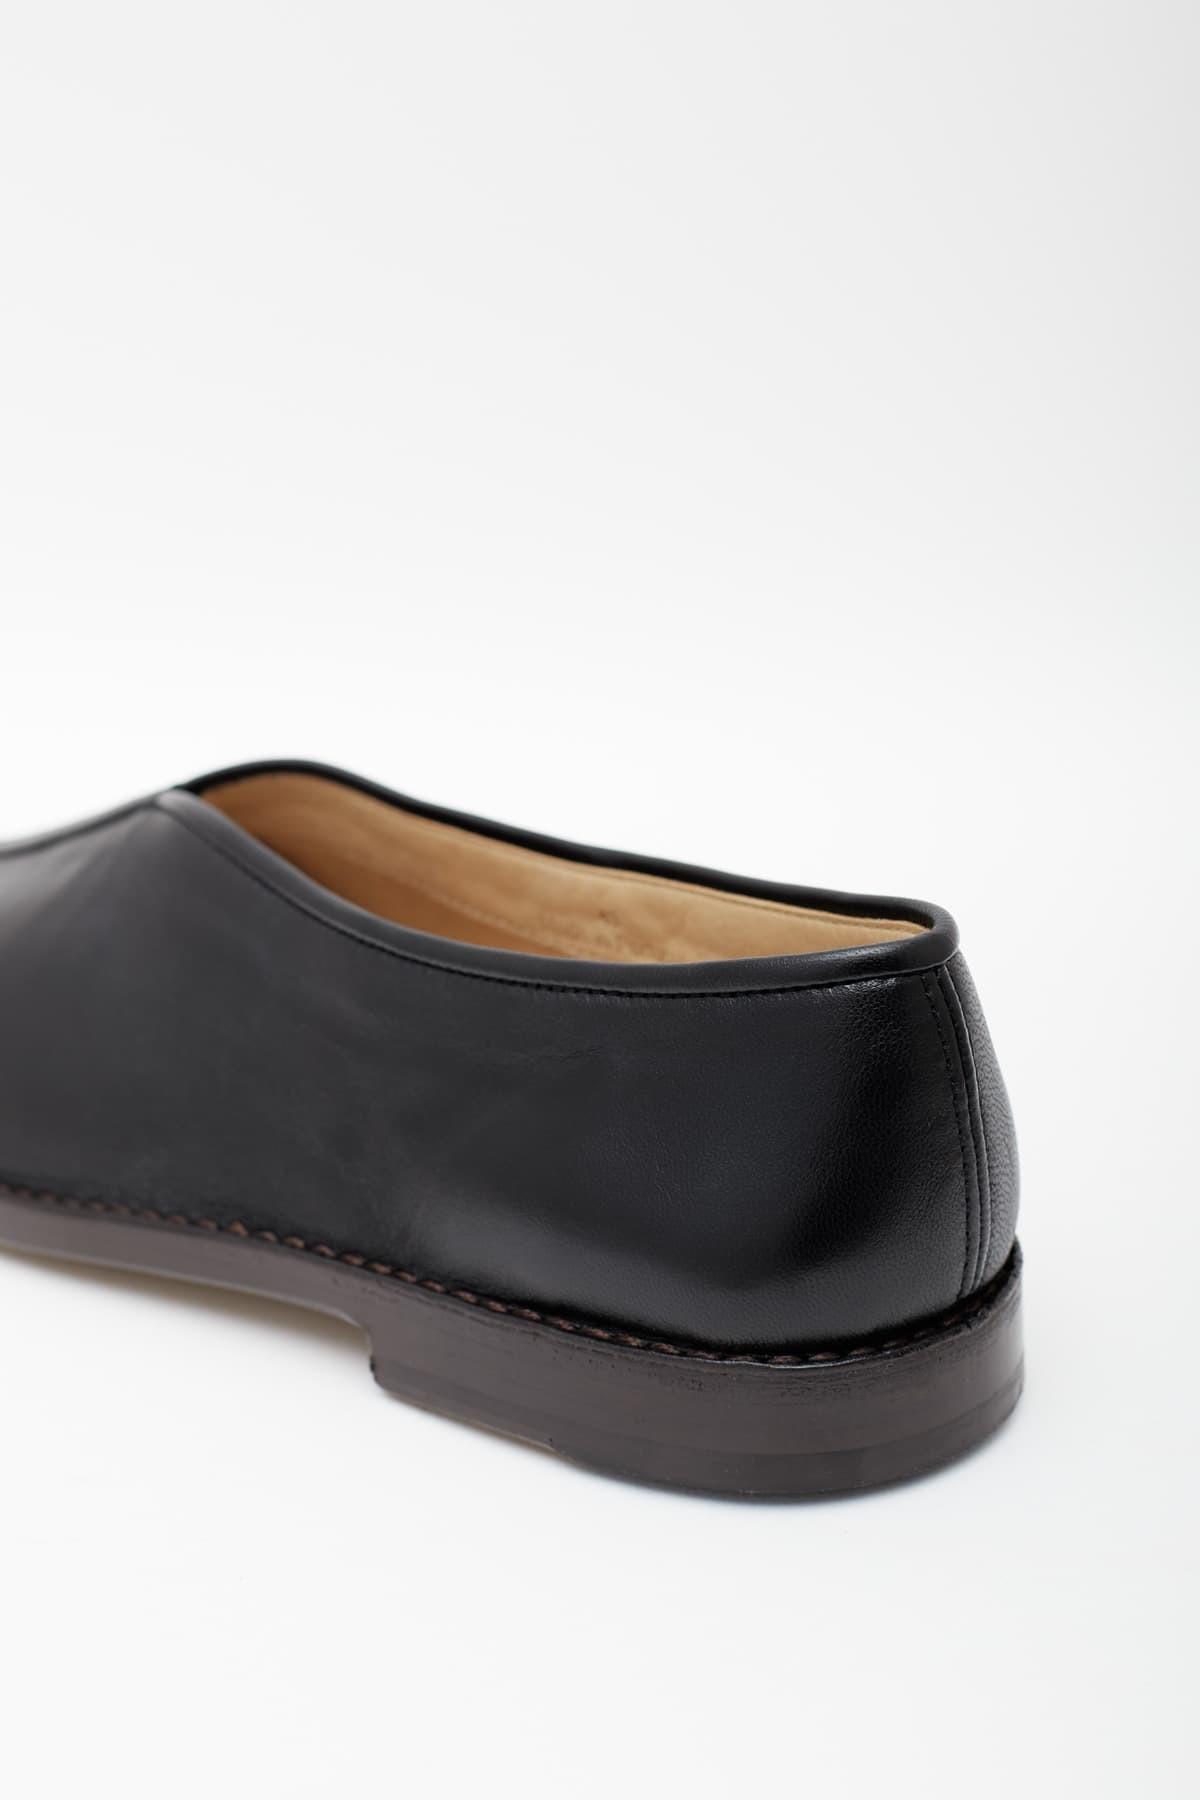 Comprar Aries Red Tailored Column Jacquard Jacket